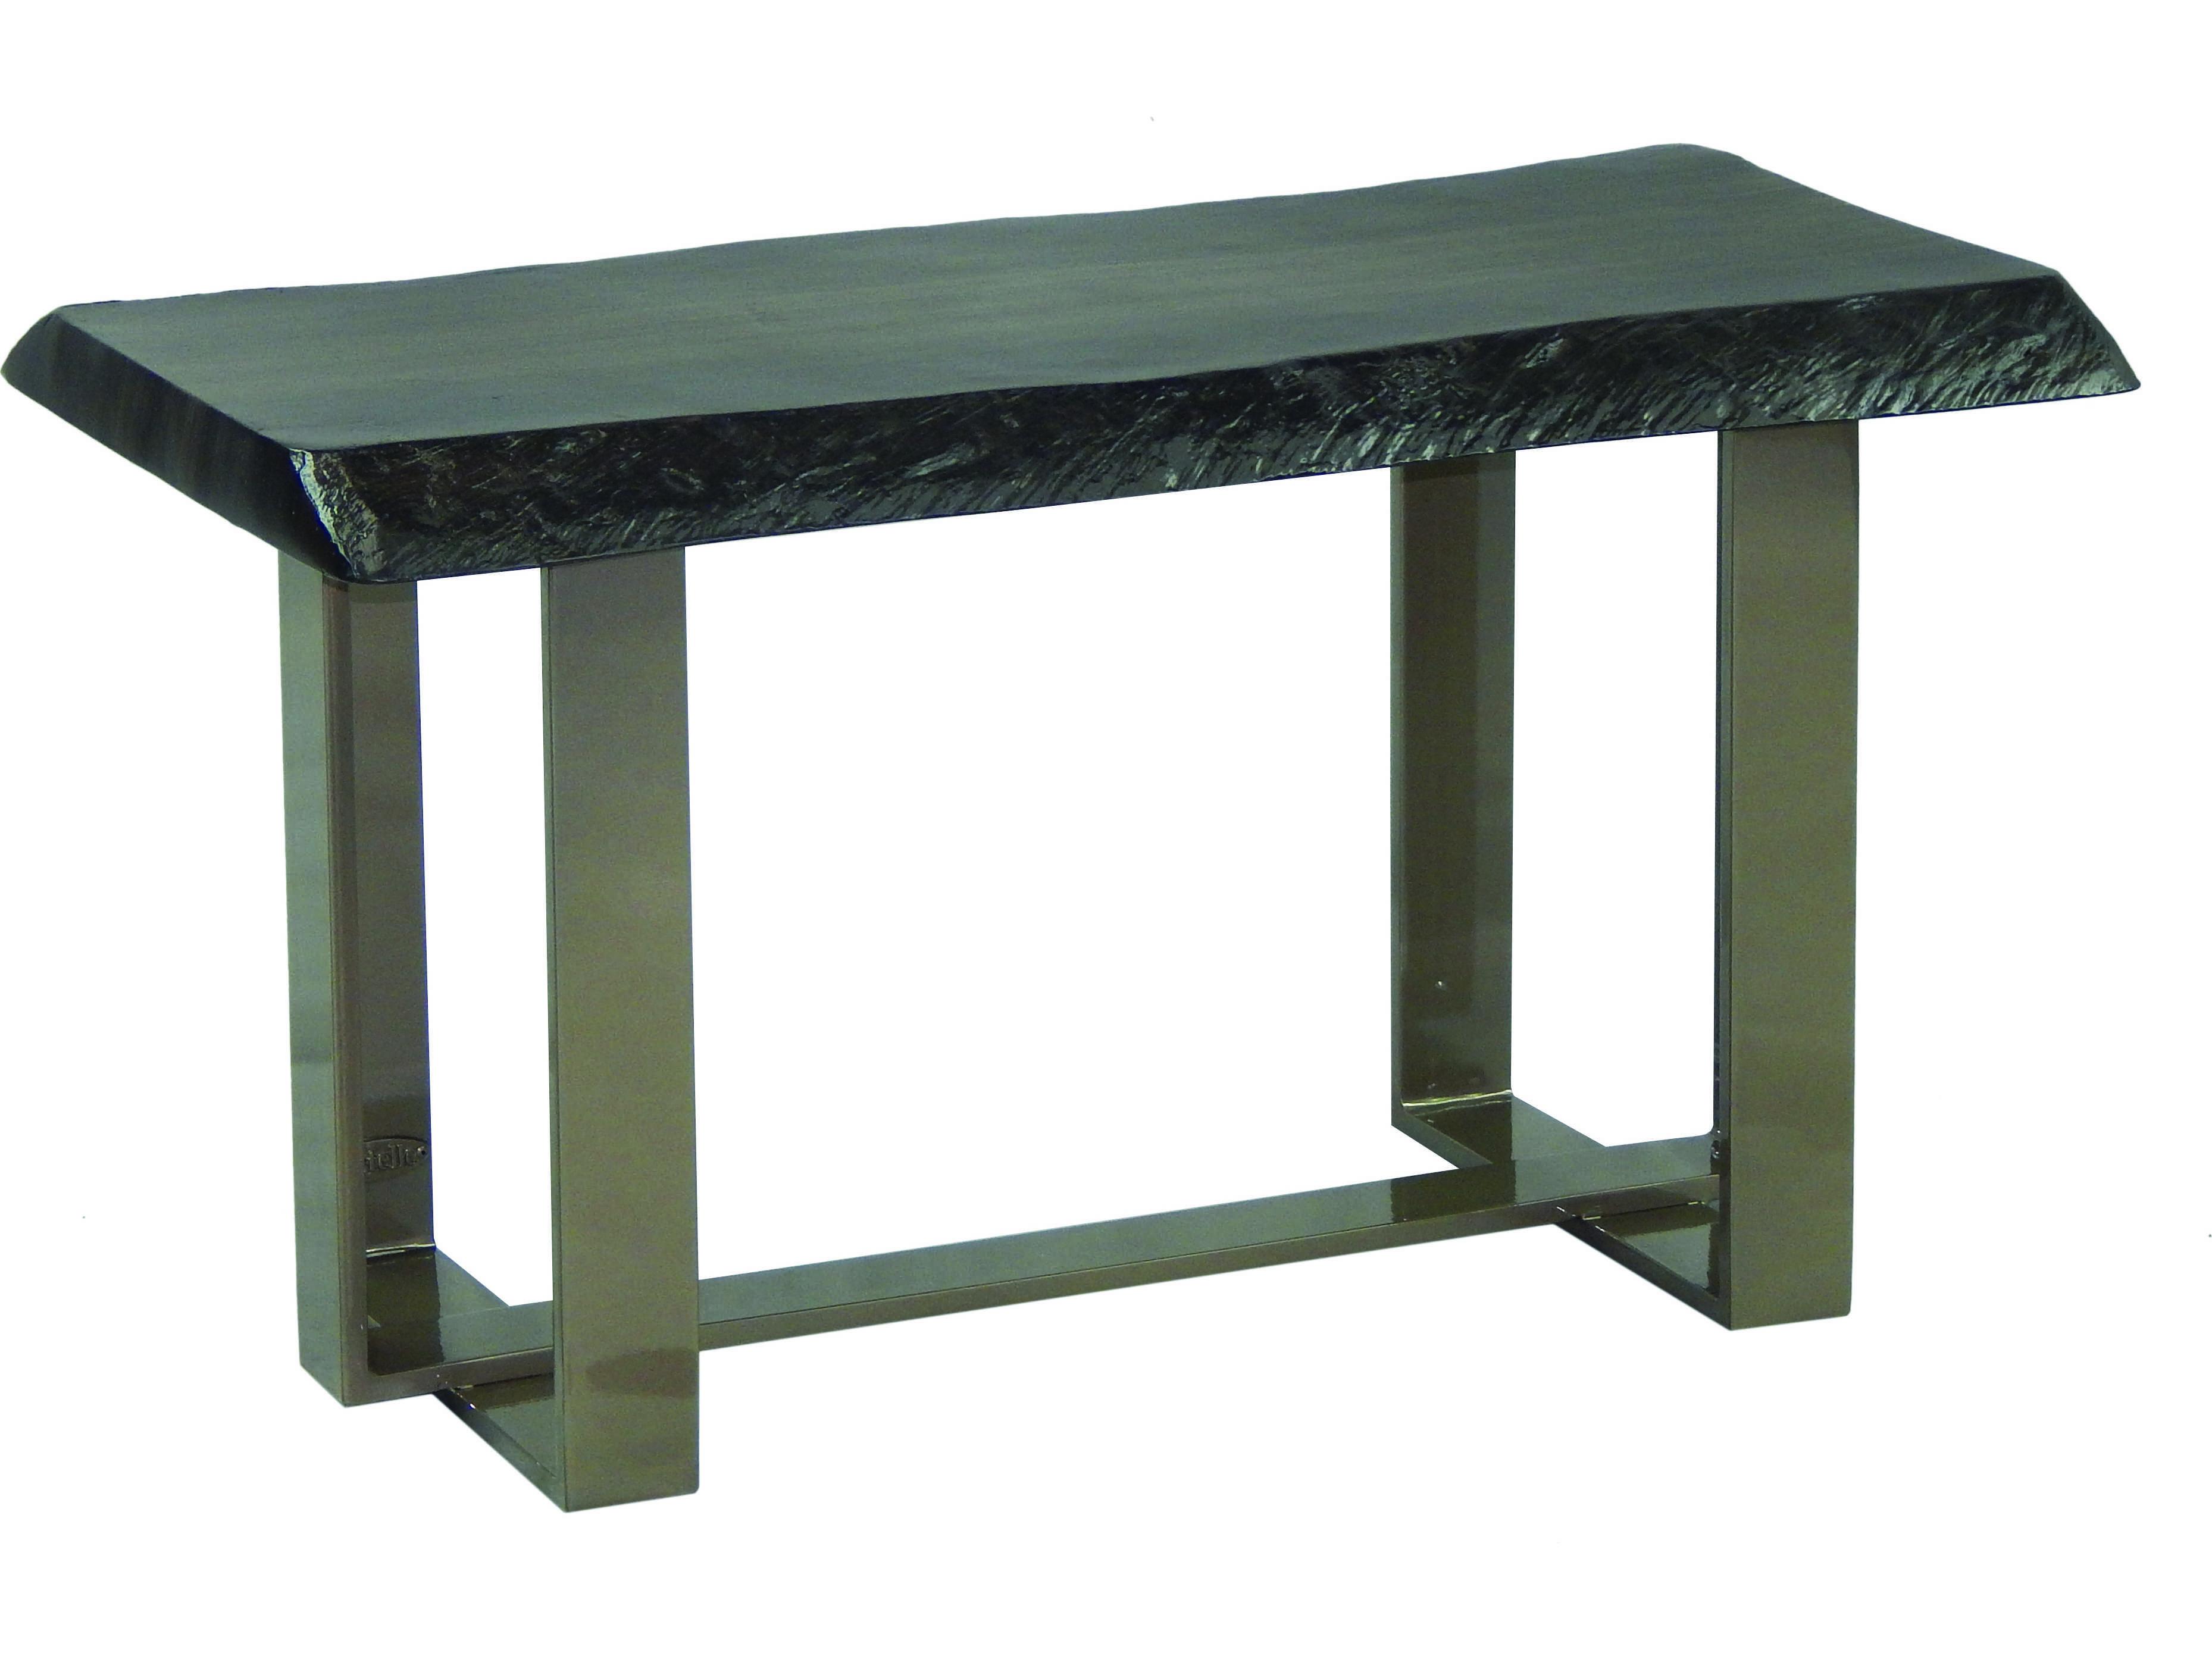 Castelle Moderna Cast Aluminum 34 X 18 Rectangular Coffee Table Hrc3418